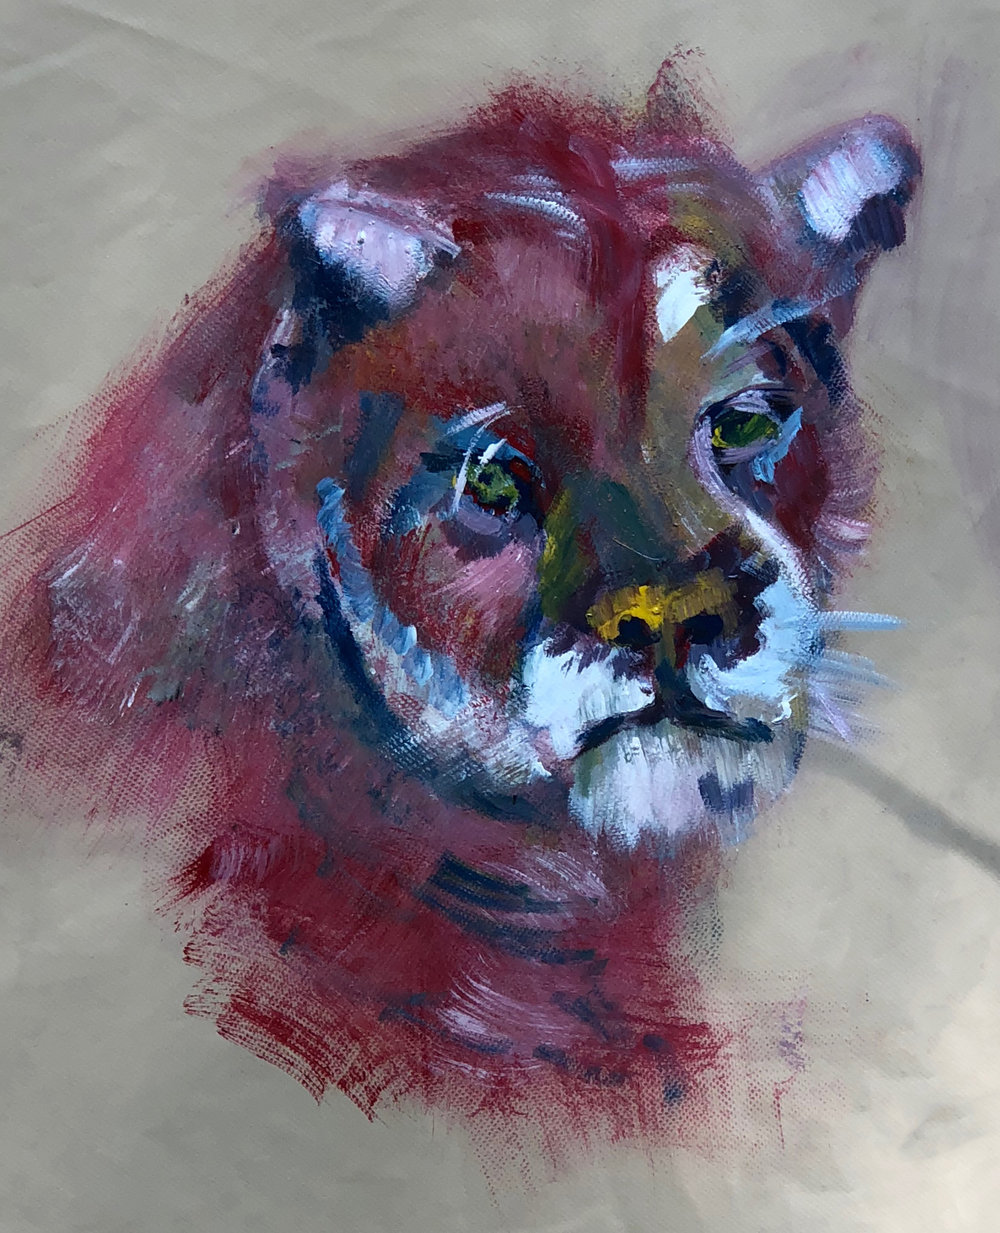 cougar1-rubylakeresort-kayompoyi.jpg